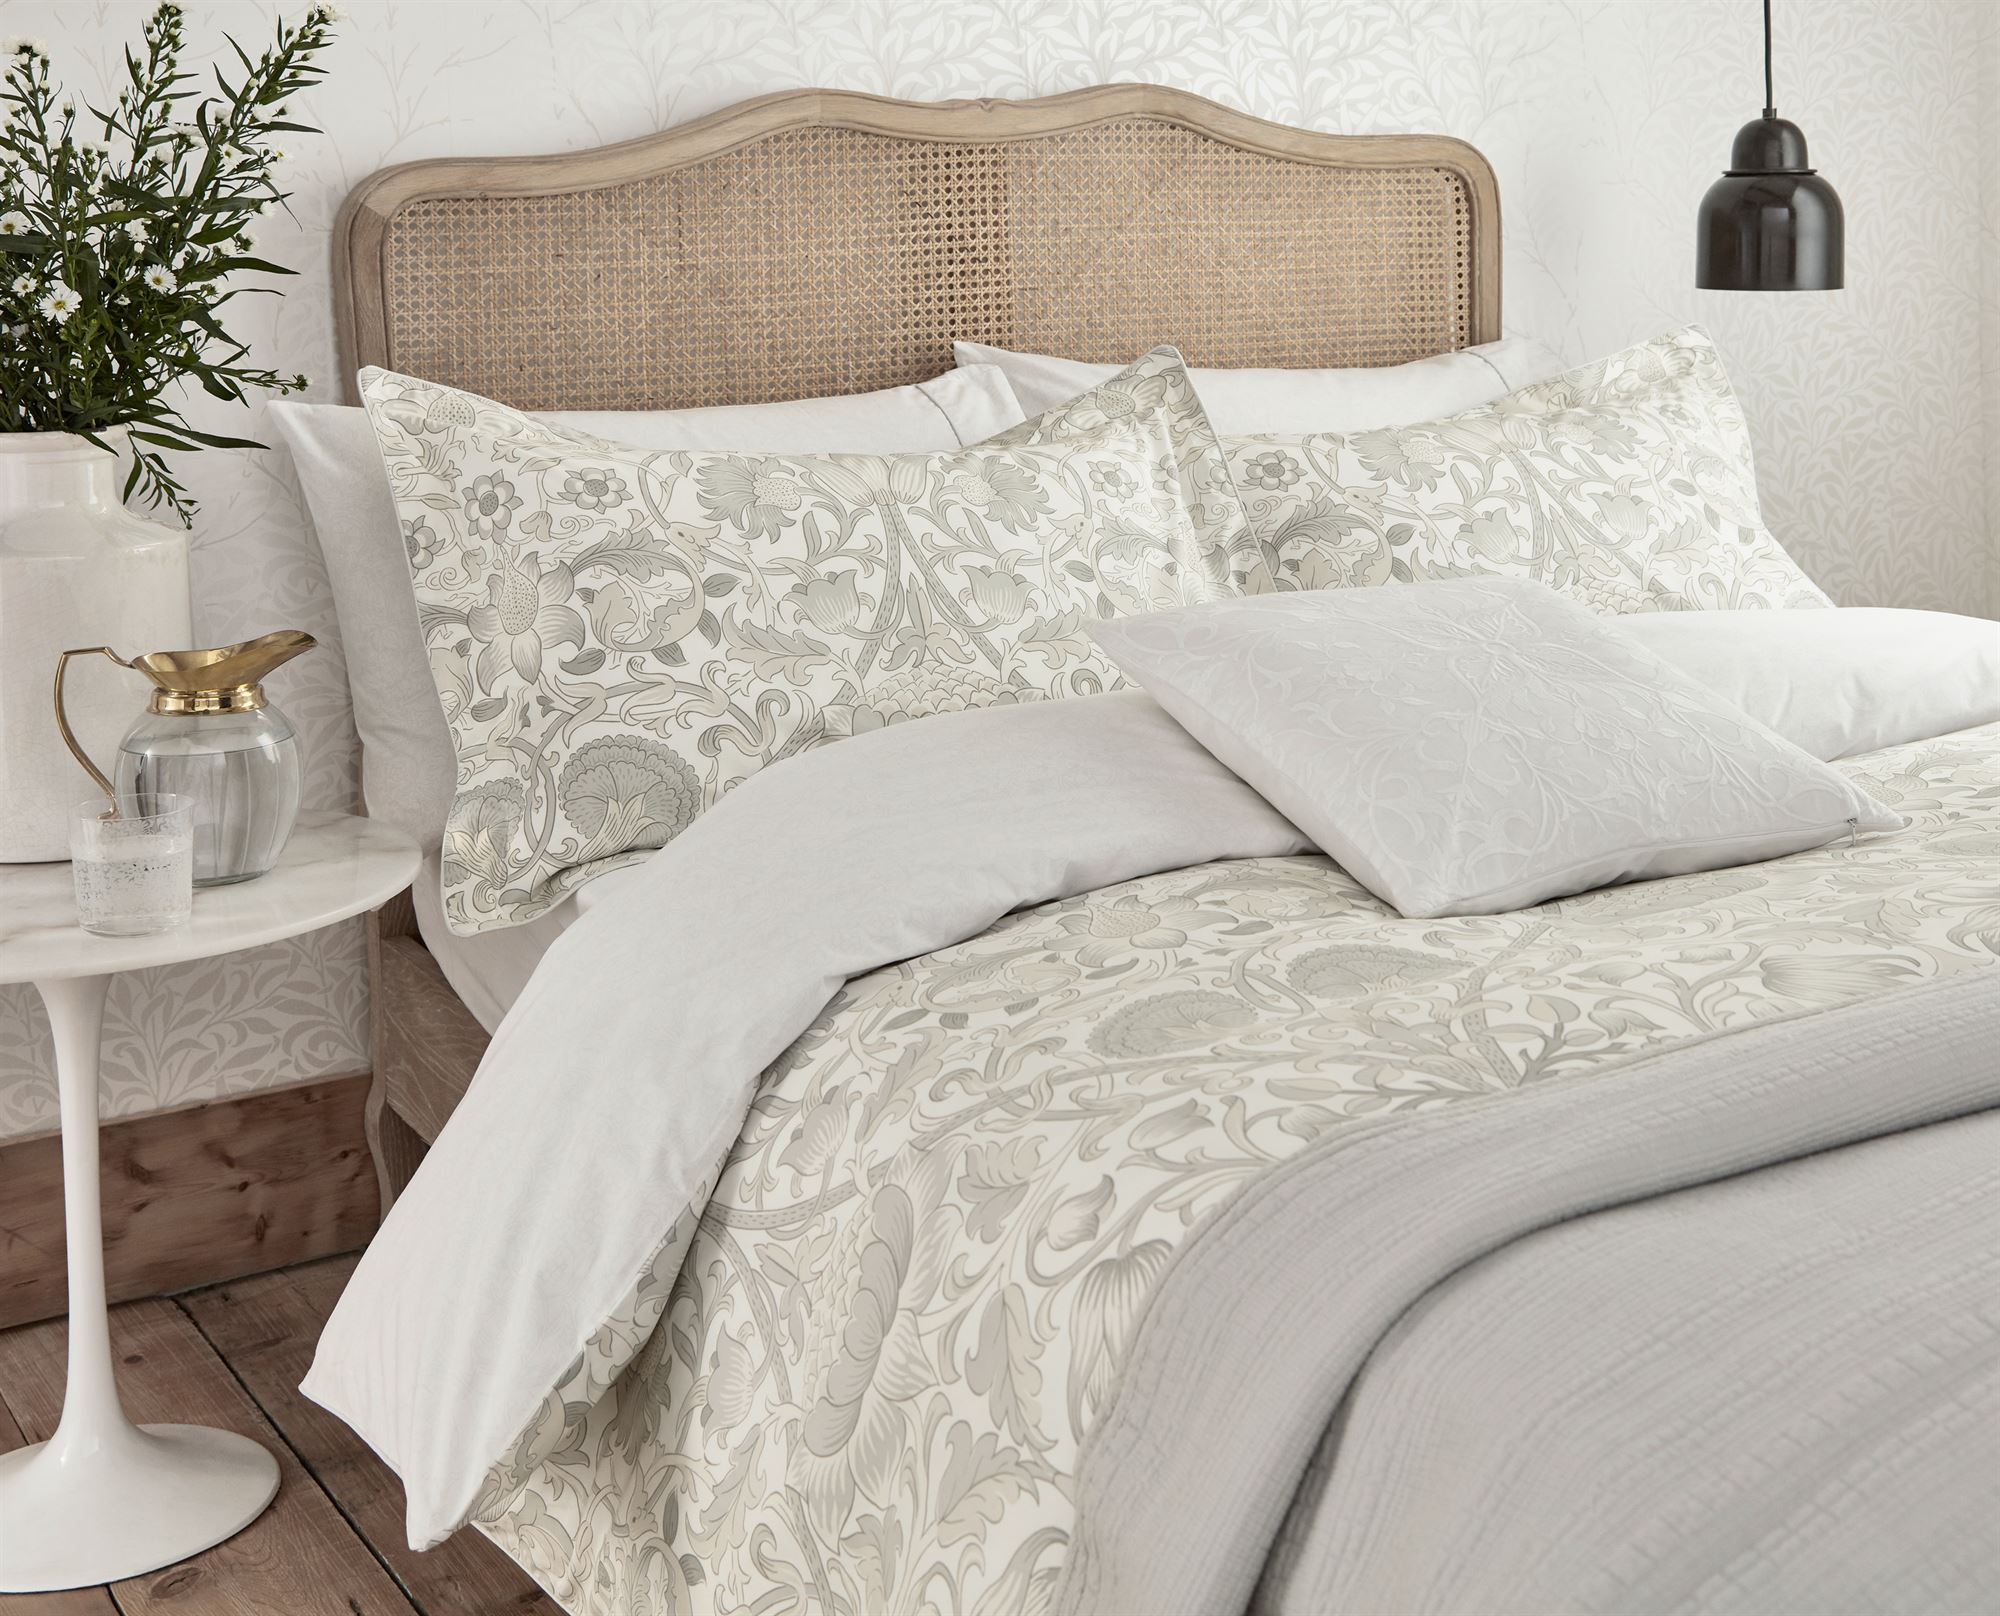 William Morris Pure Lodden Bedding Range